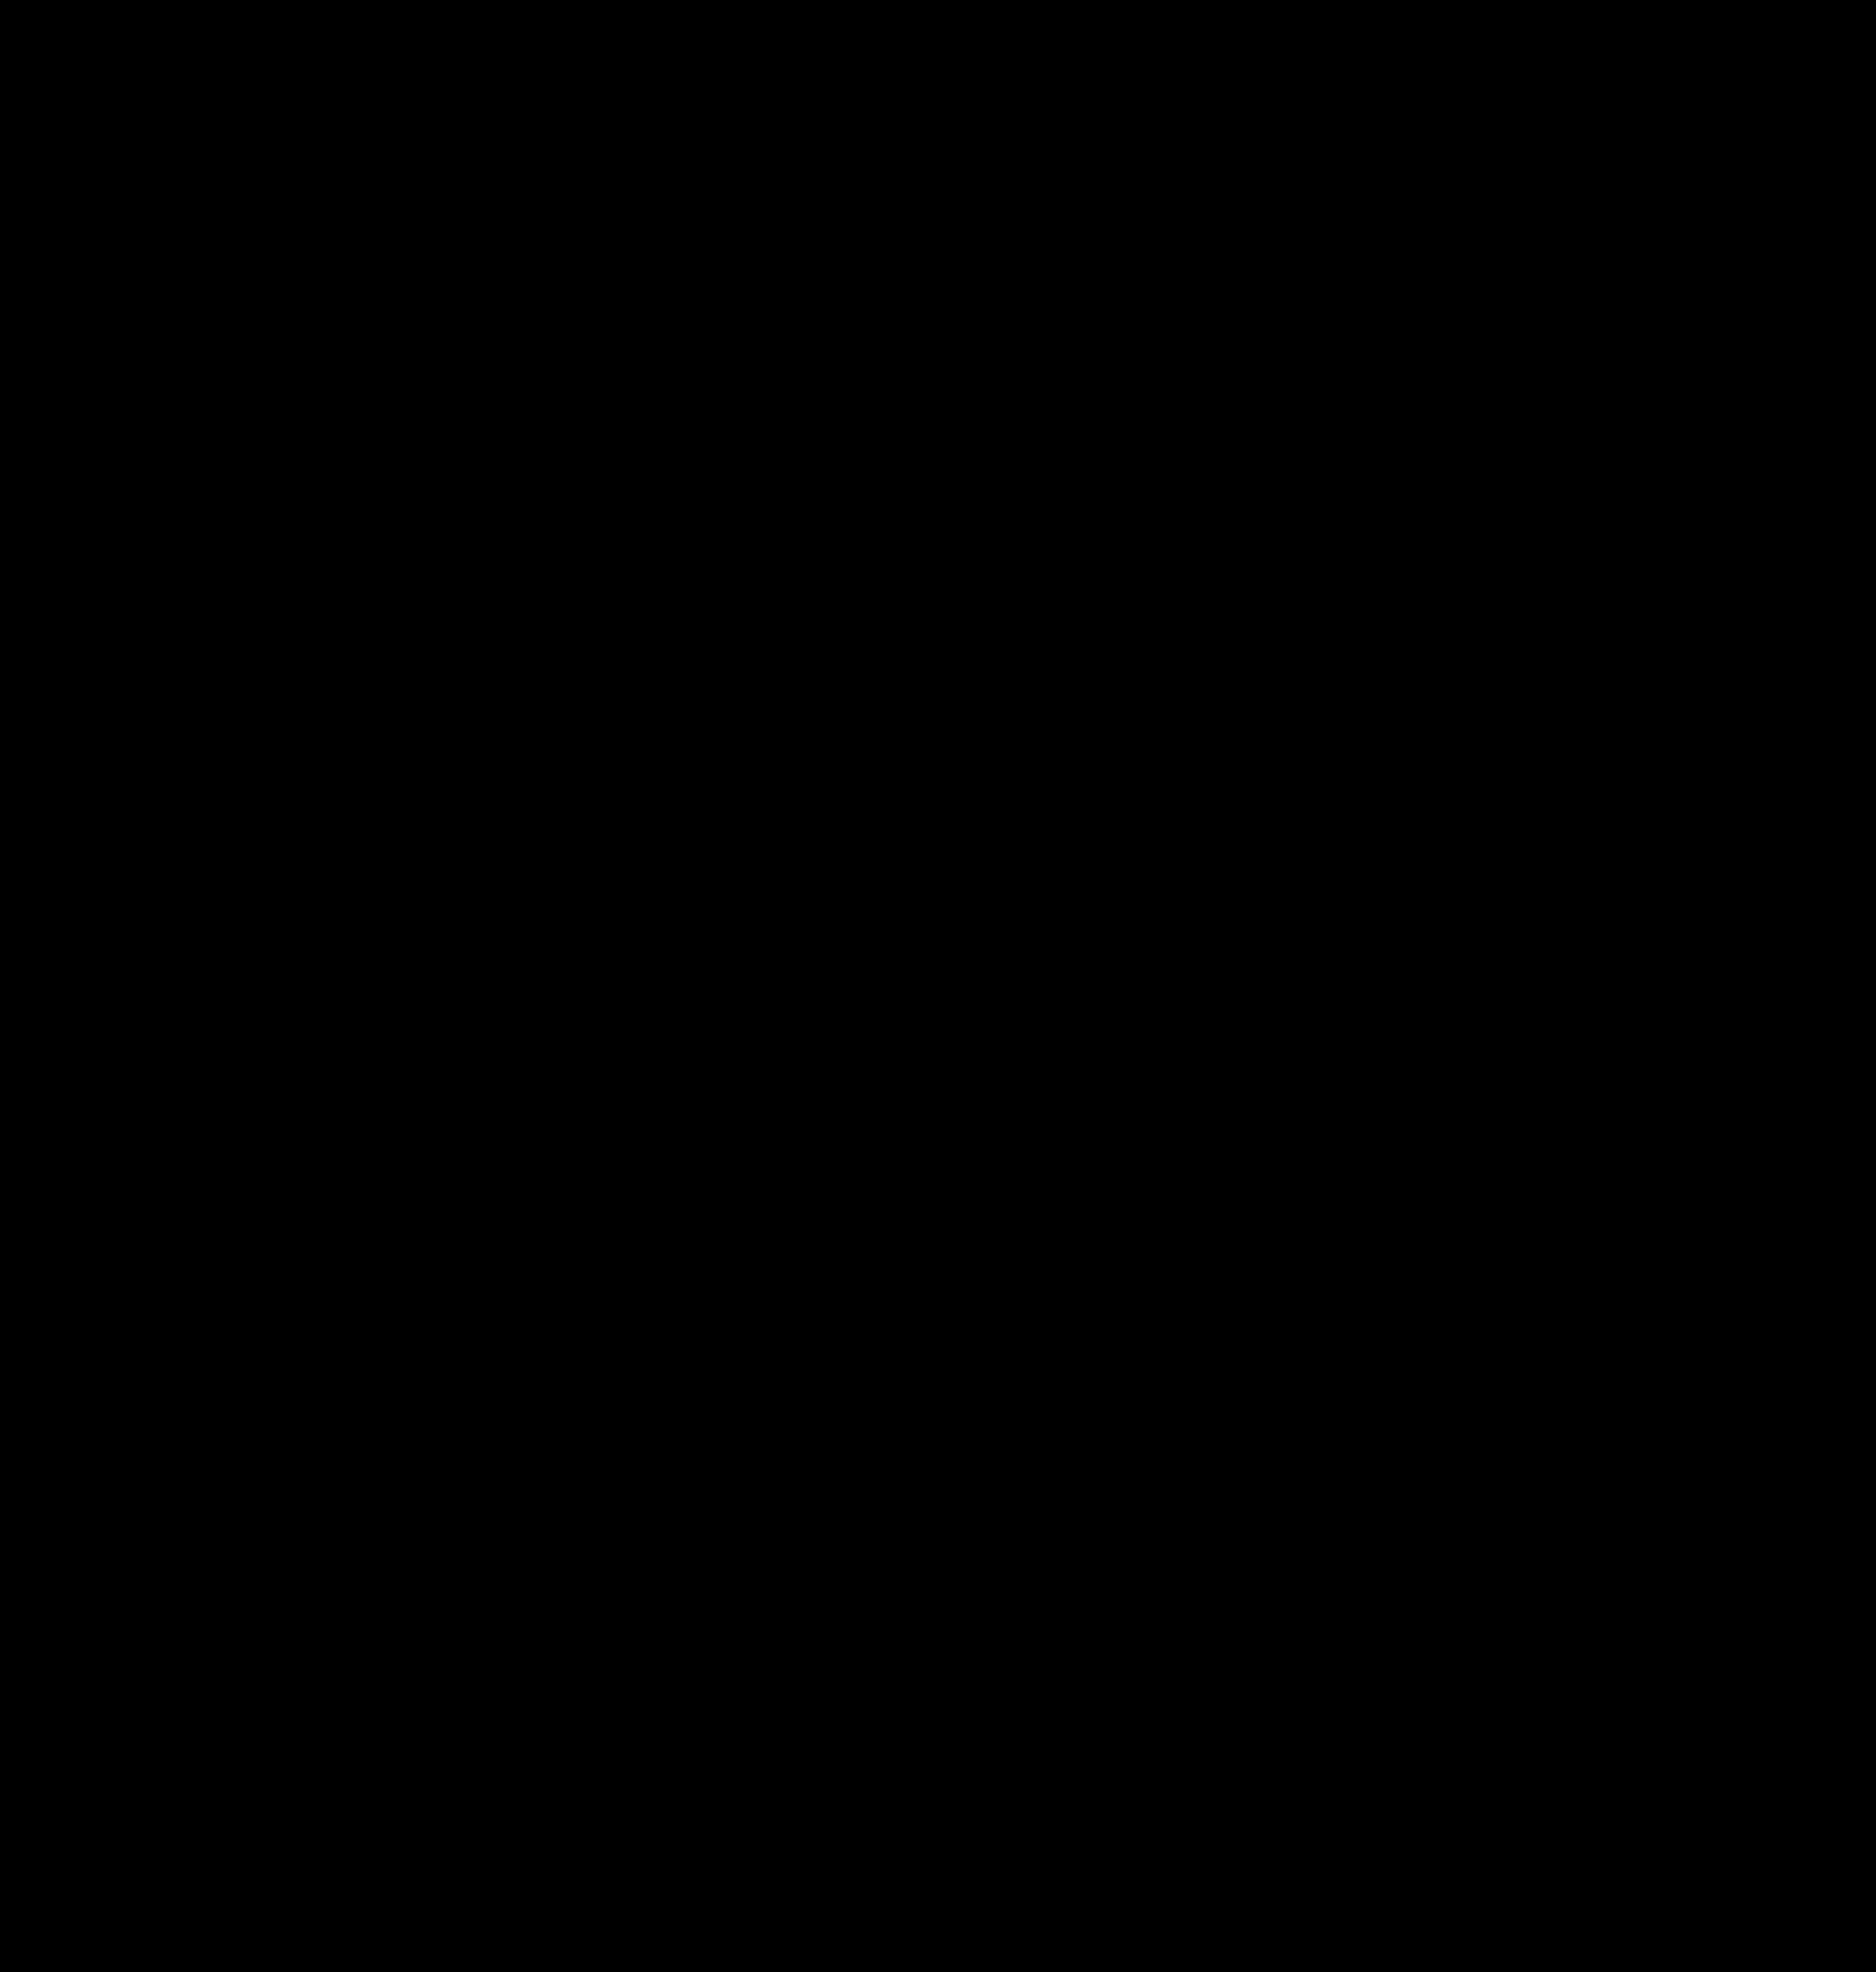 Clipart sunshine icon. Sun big image png